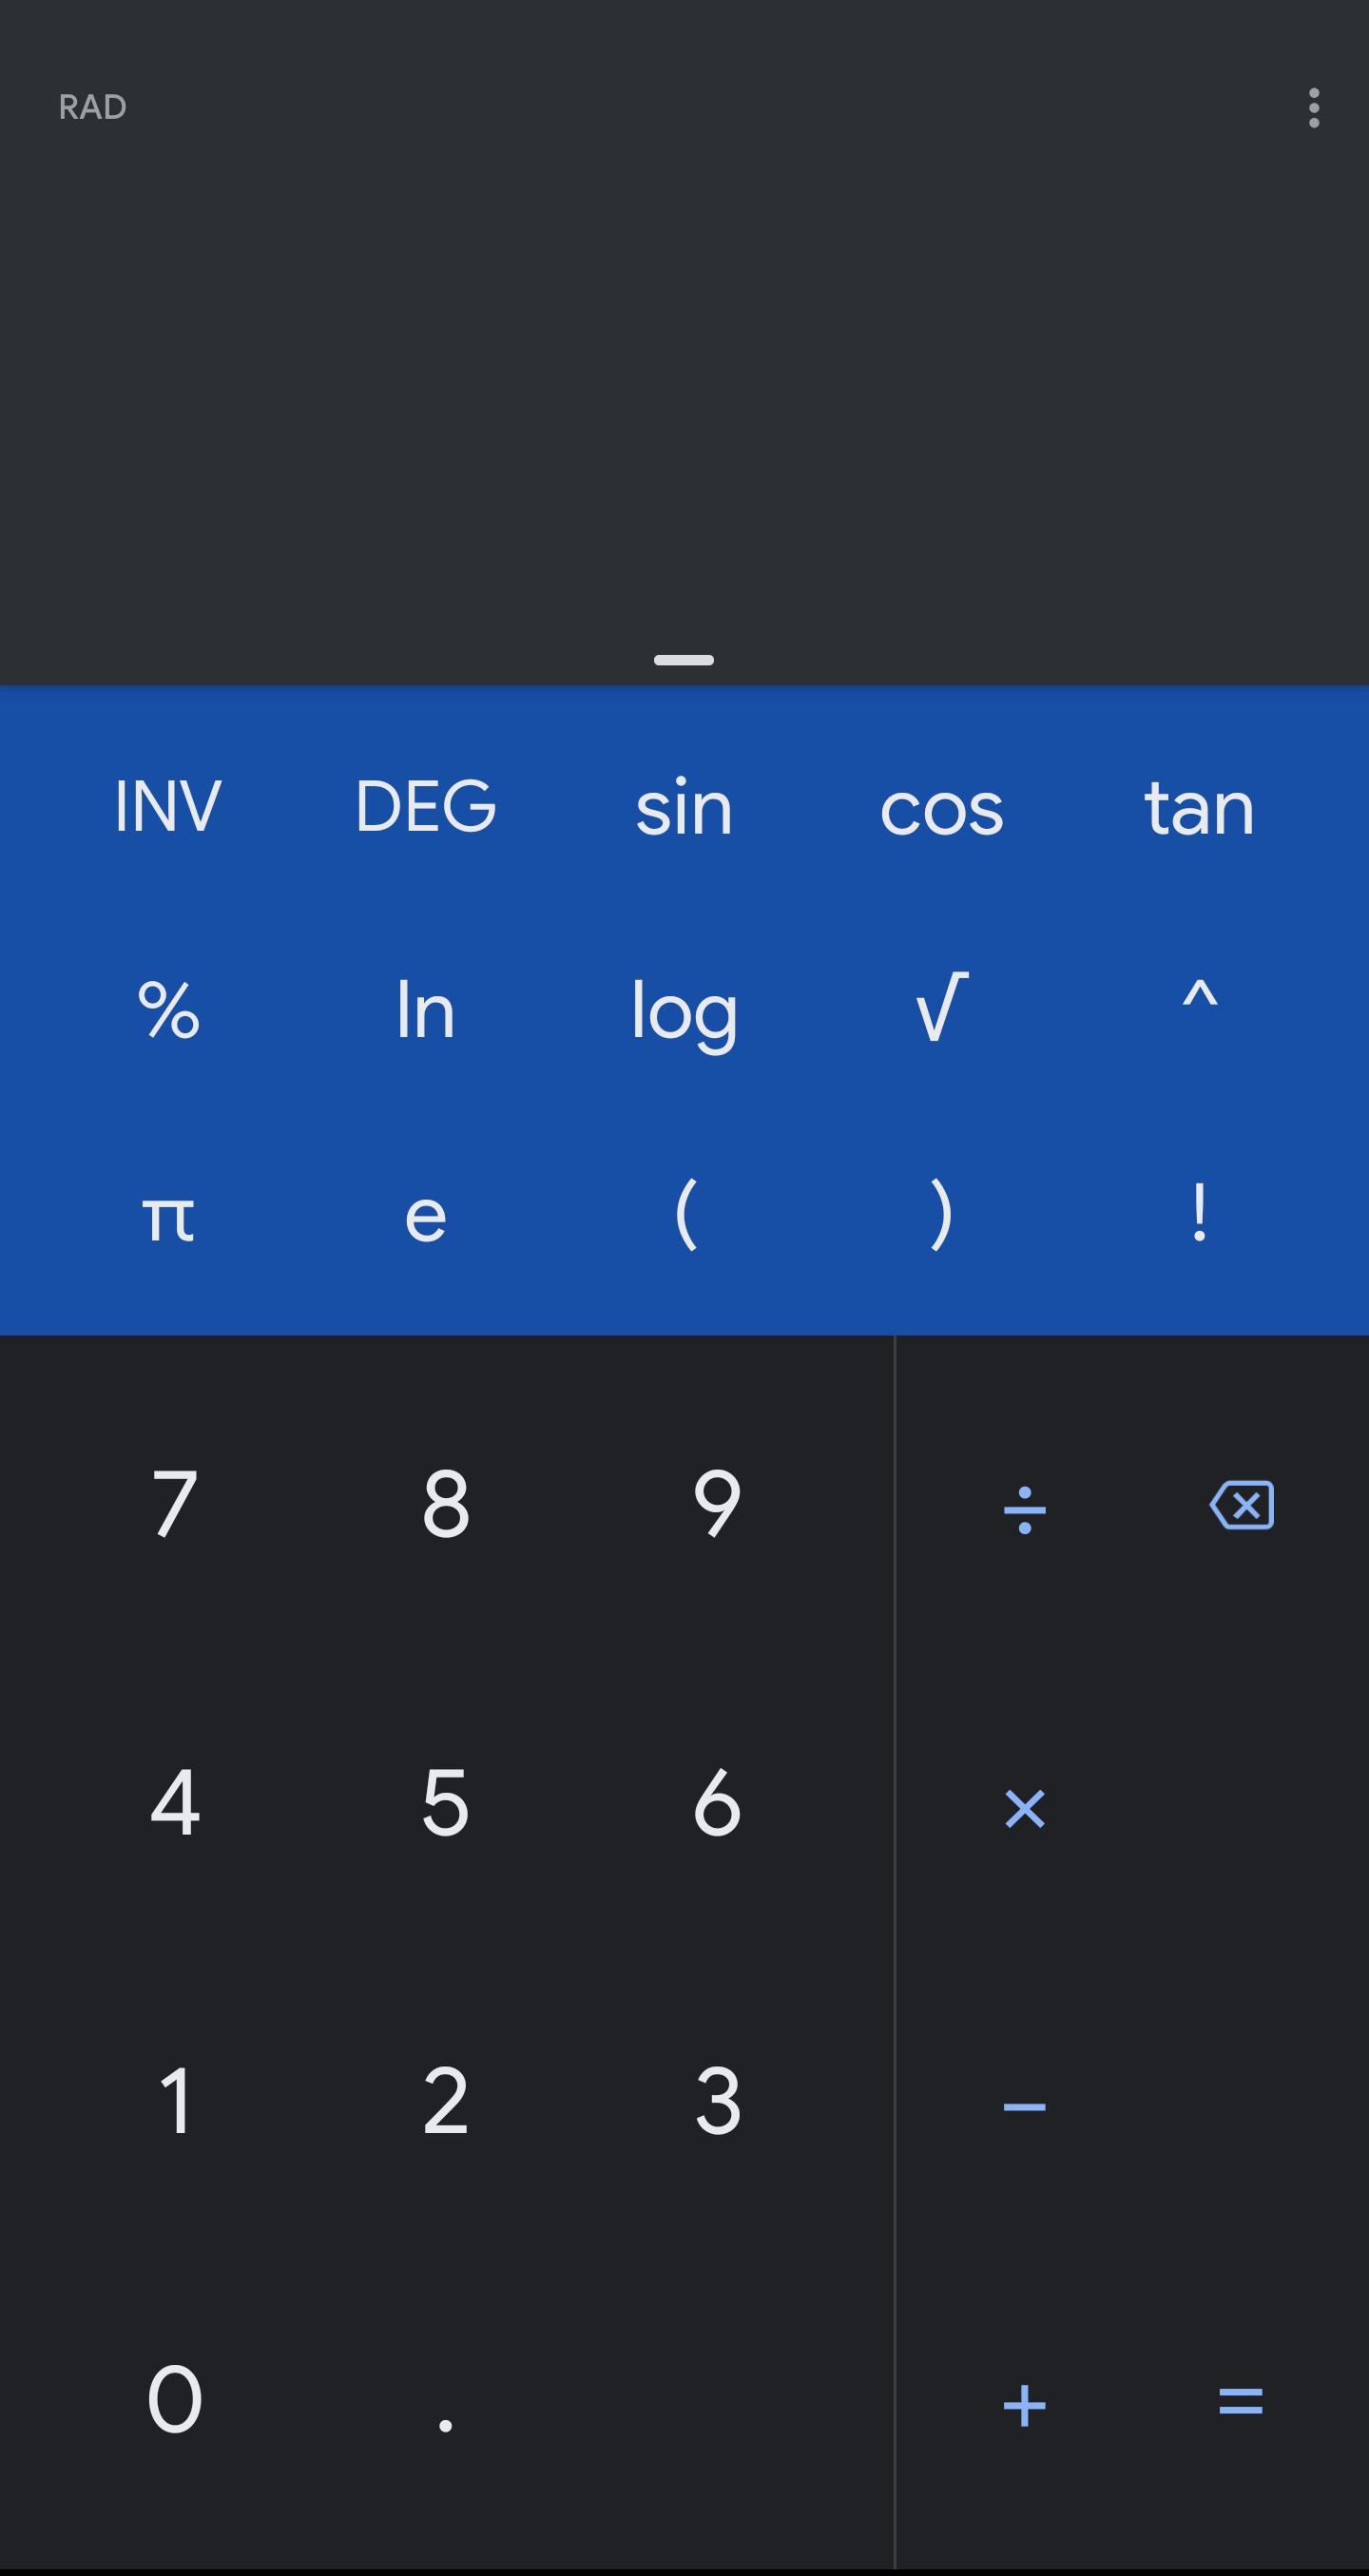 Google Calculator gets dark theme with update to v7 6 [APK